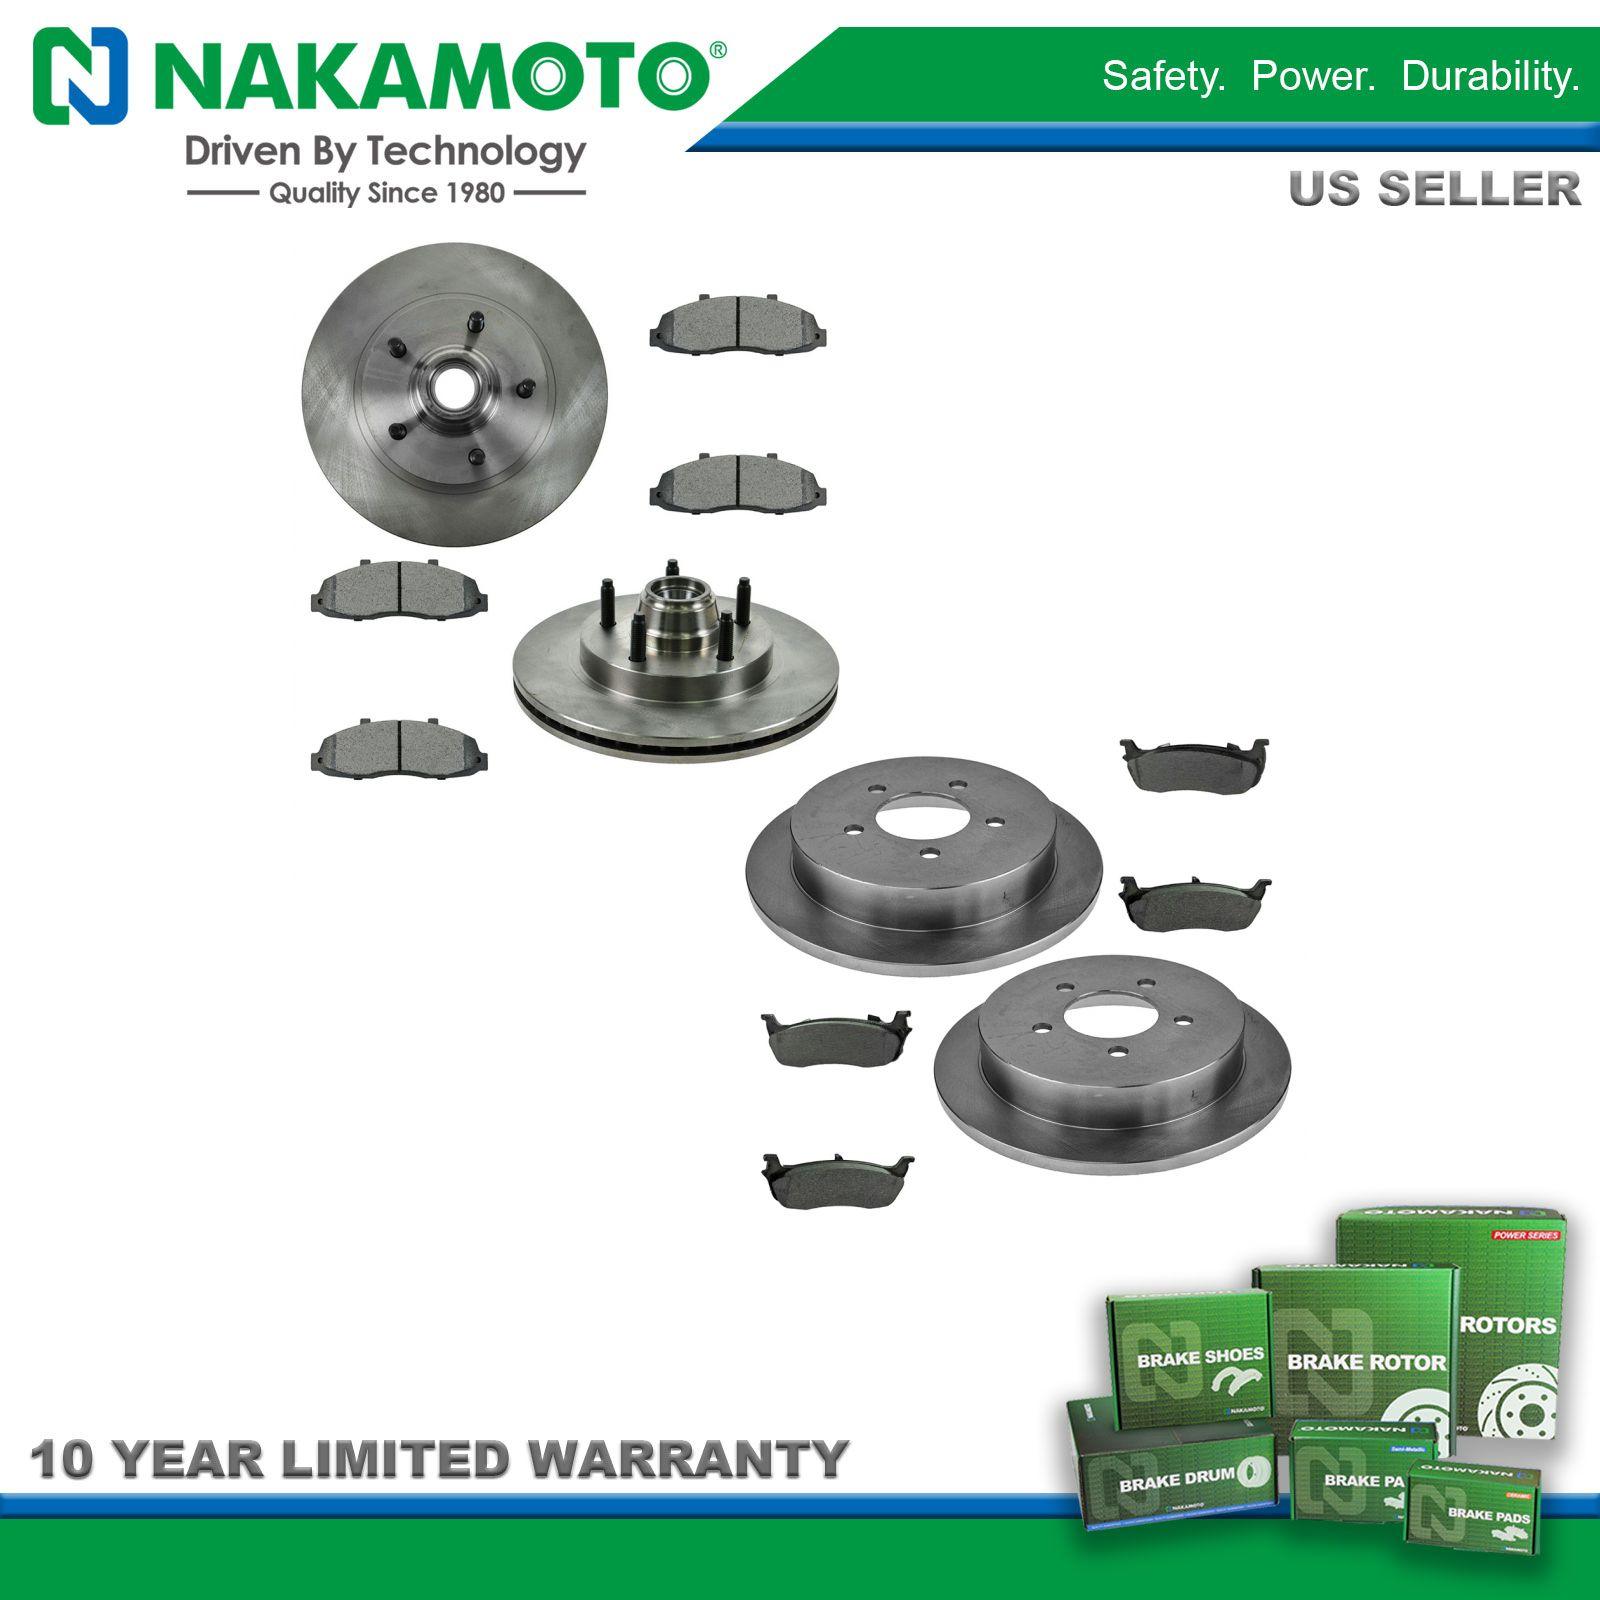 Nakamoto Front /& Rear Premium Posi Metallic Disc Brake Pad Kit for GM Truck New